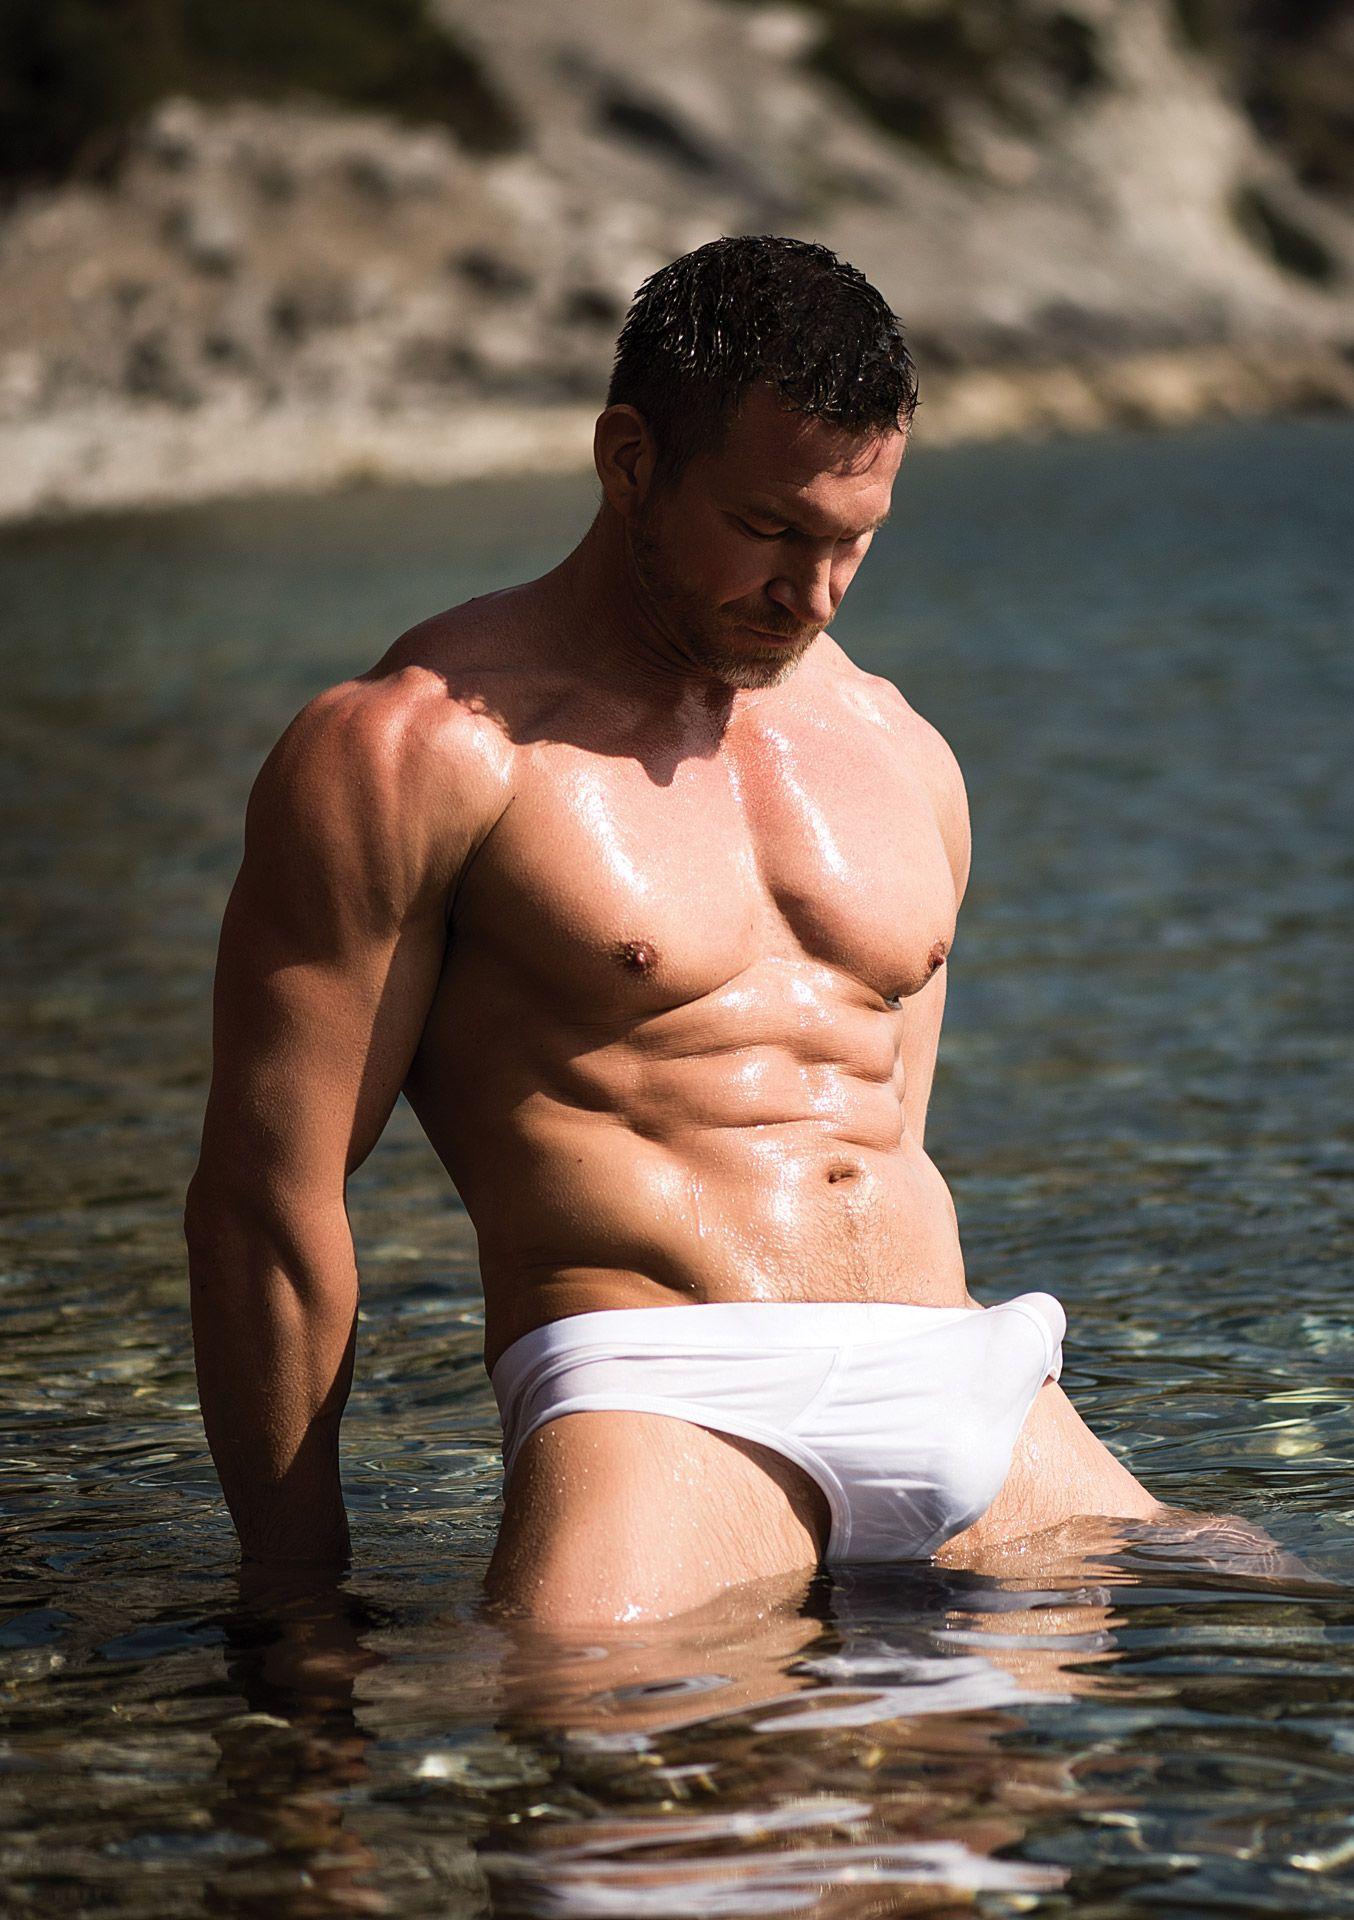 Tomas Brand Beach Lucasentertainment 2 Underwear Hot